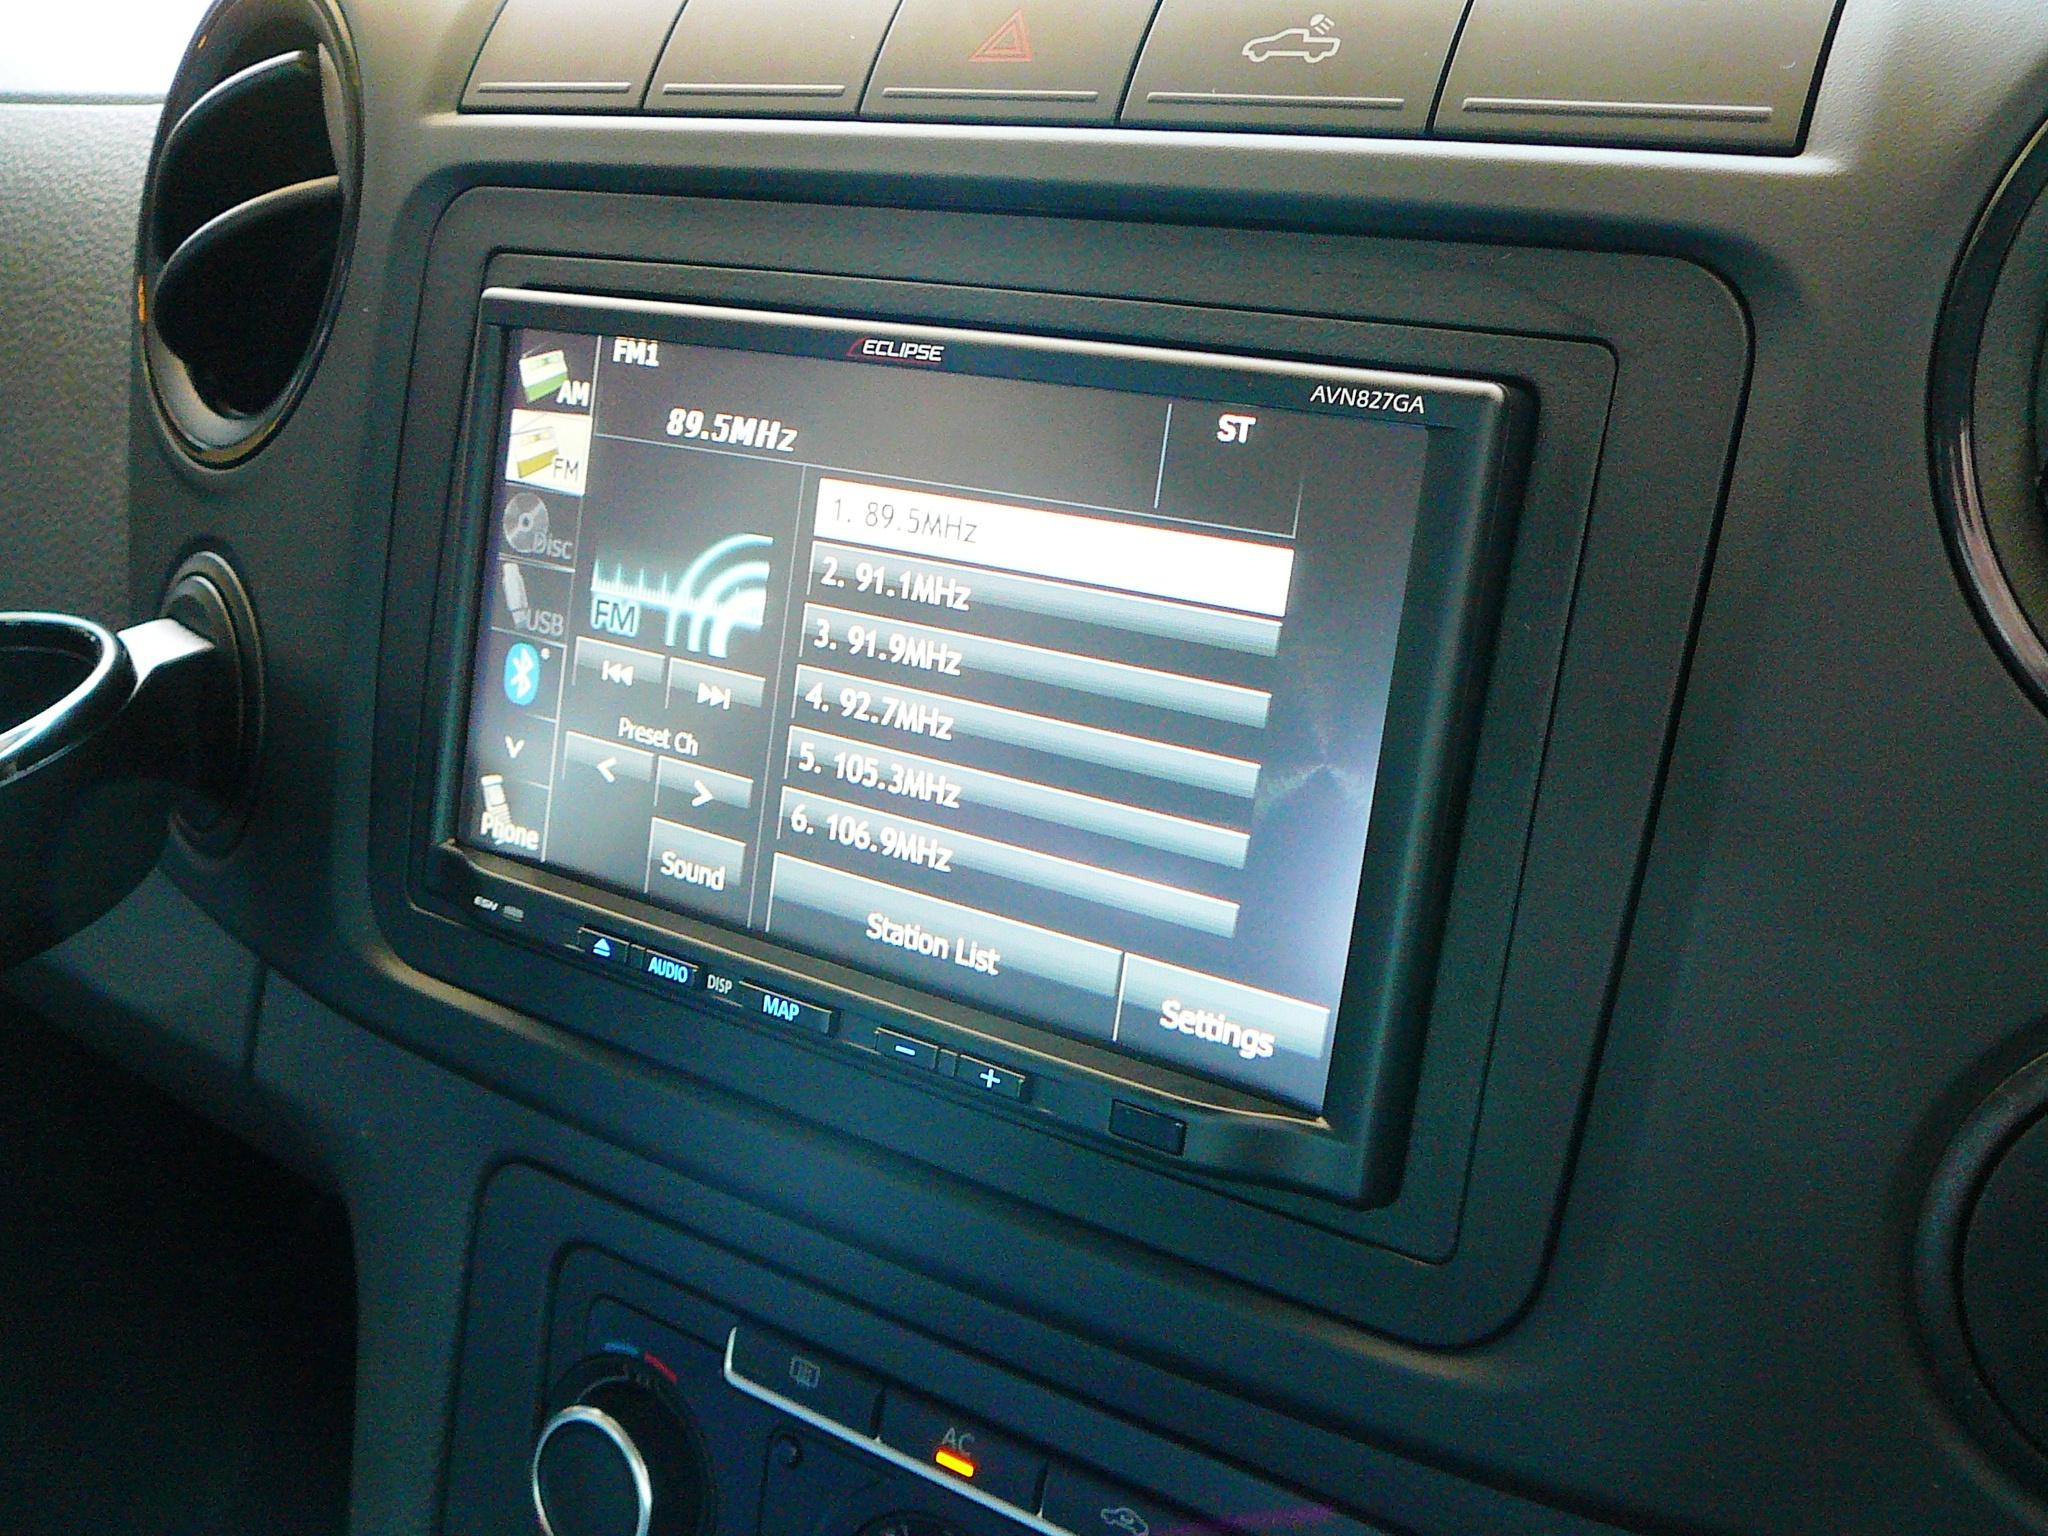 VW AMAROK GPS NAVIGATION, ECLIPSE AVN827GA INSTALLATION